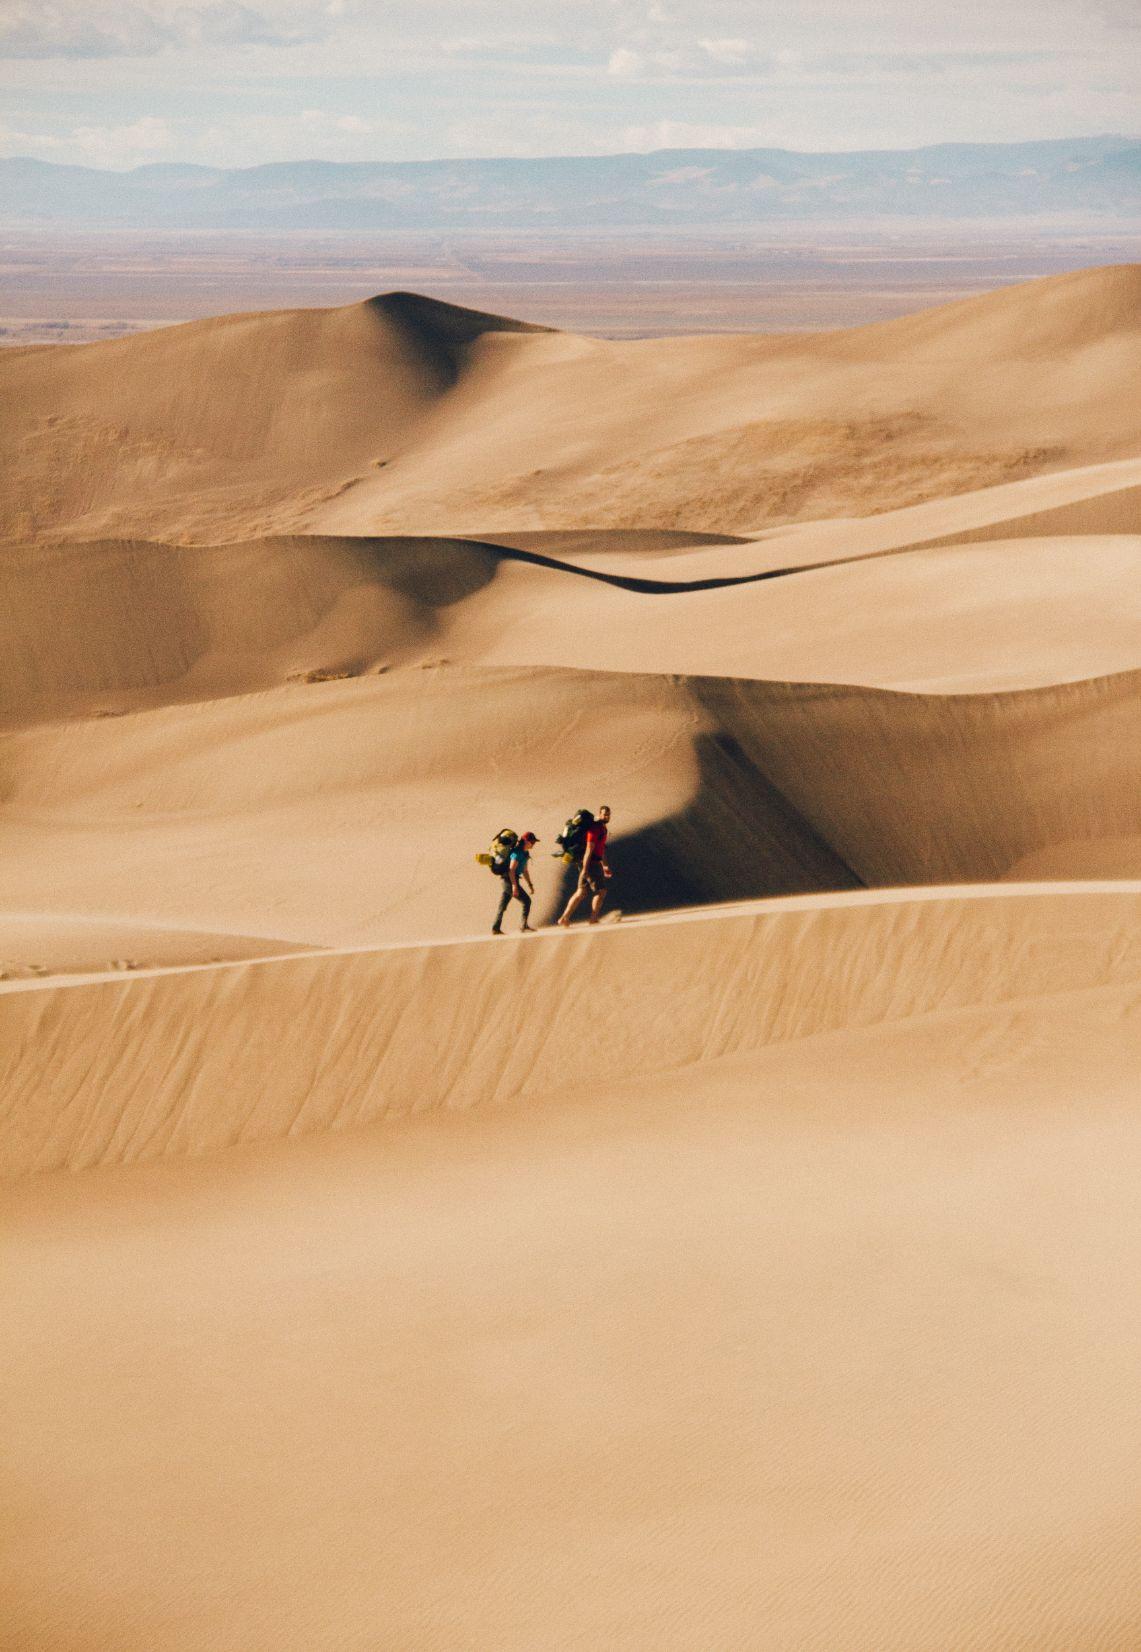 sand dunes and desert in Colorado